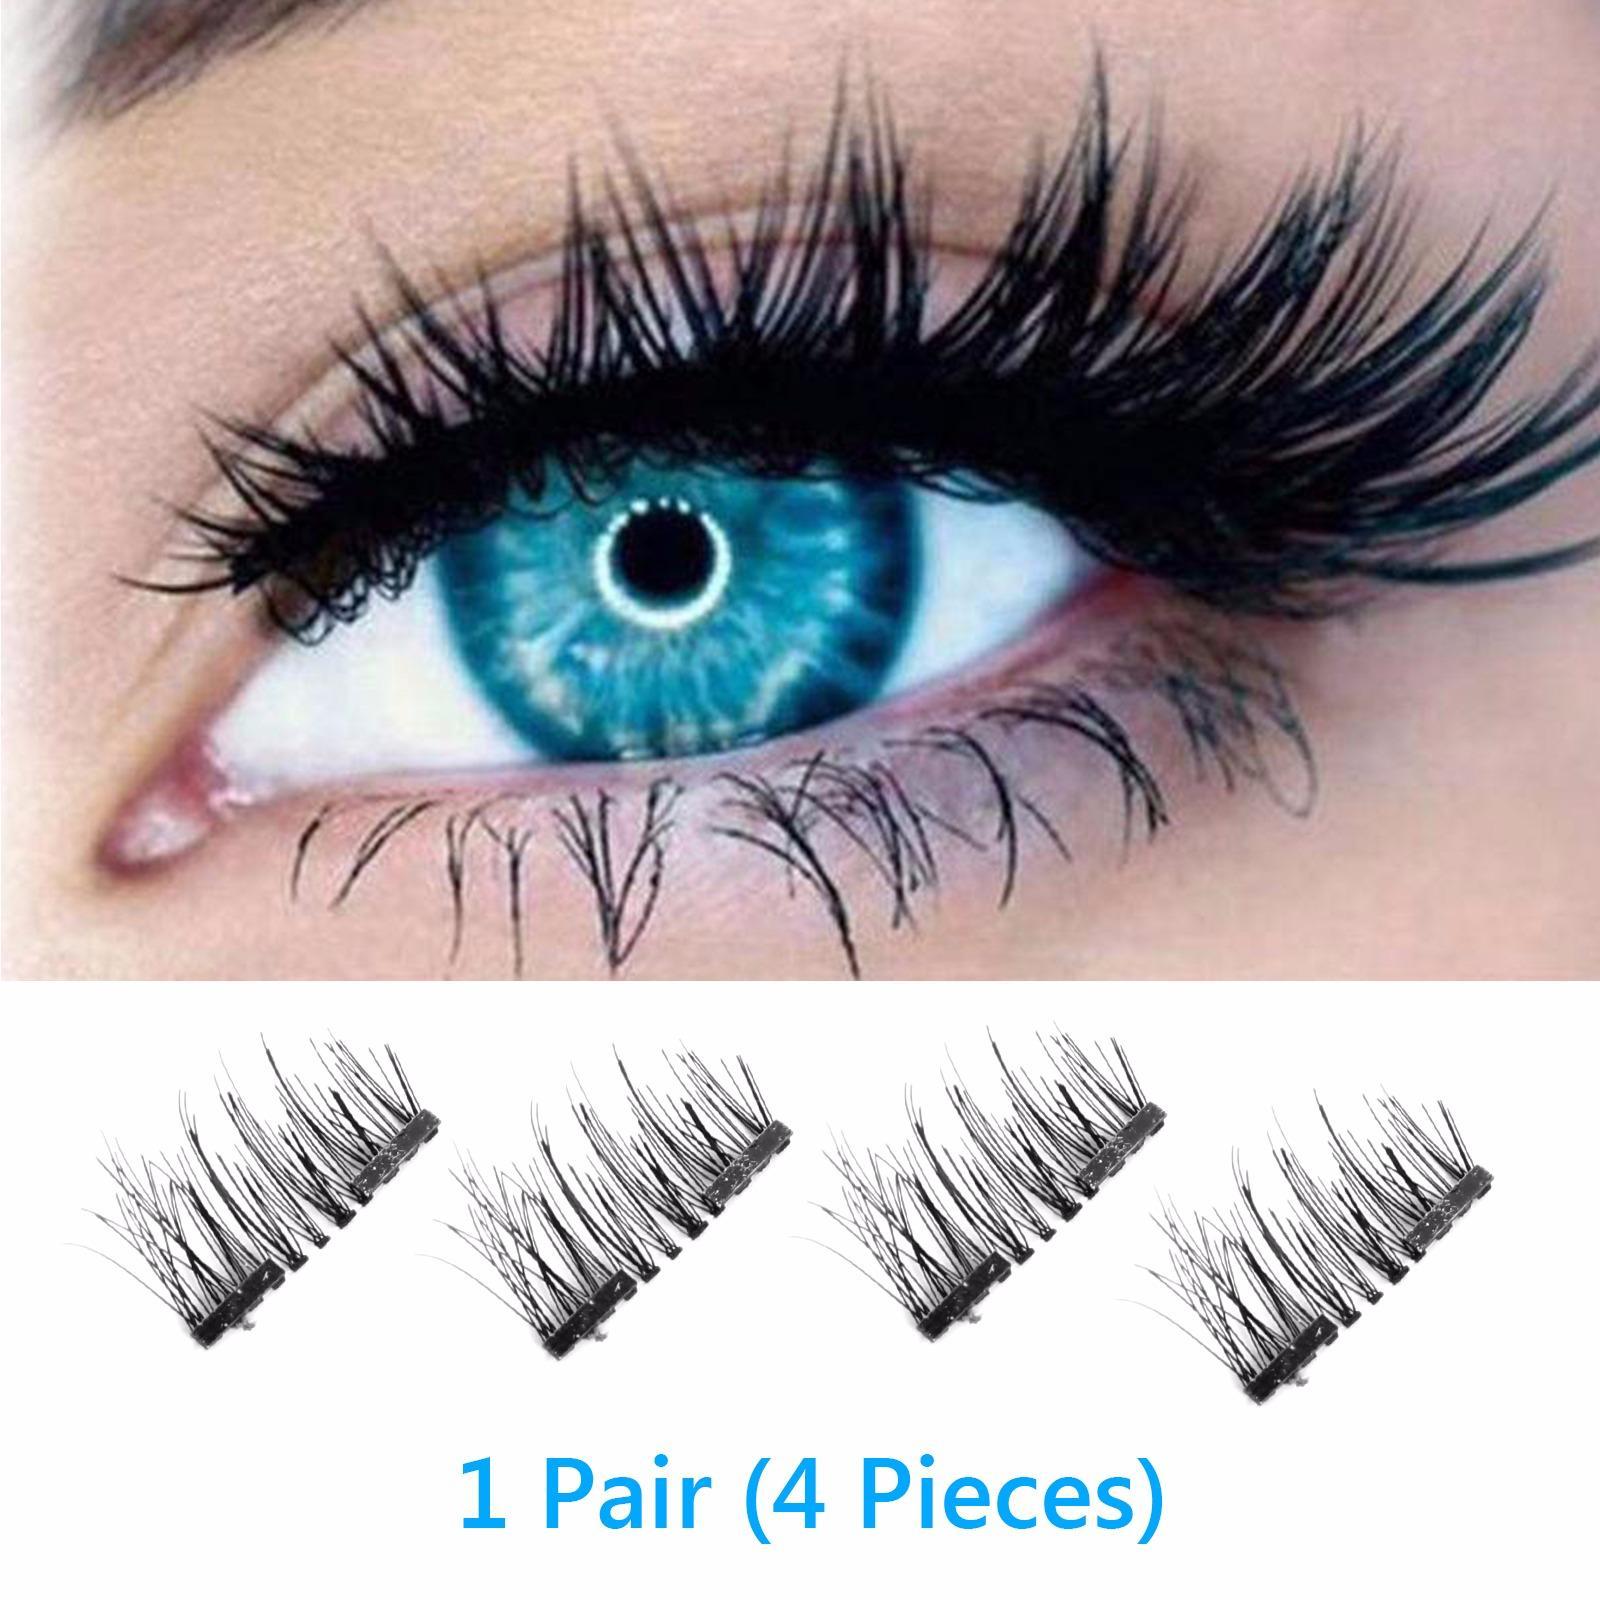 Magnetic Eyelashes False, 4pcs/pair Magnetic 3d Eyelashes Double Handmade Natural False Long Eye Lash Reusable(double Magnet Eyelashes False) By Wripples.